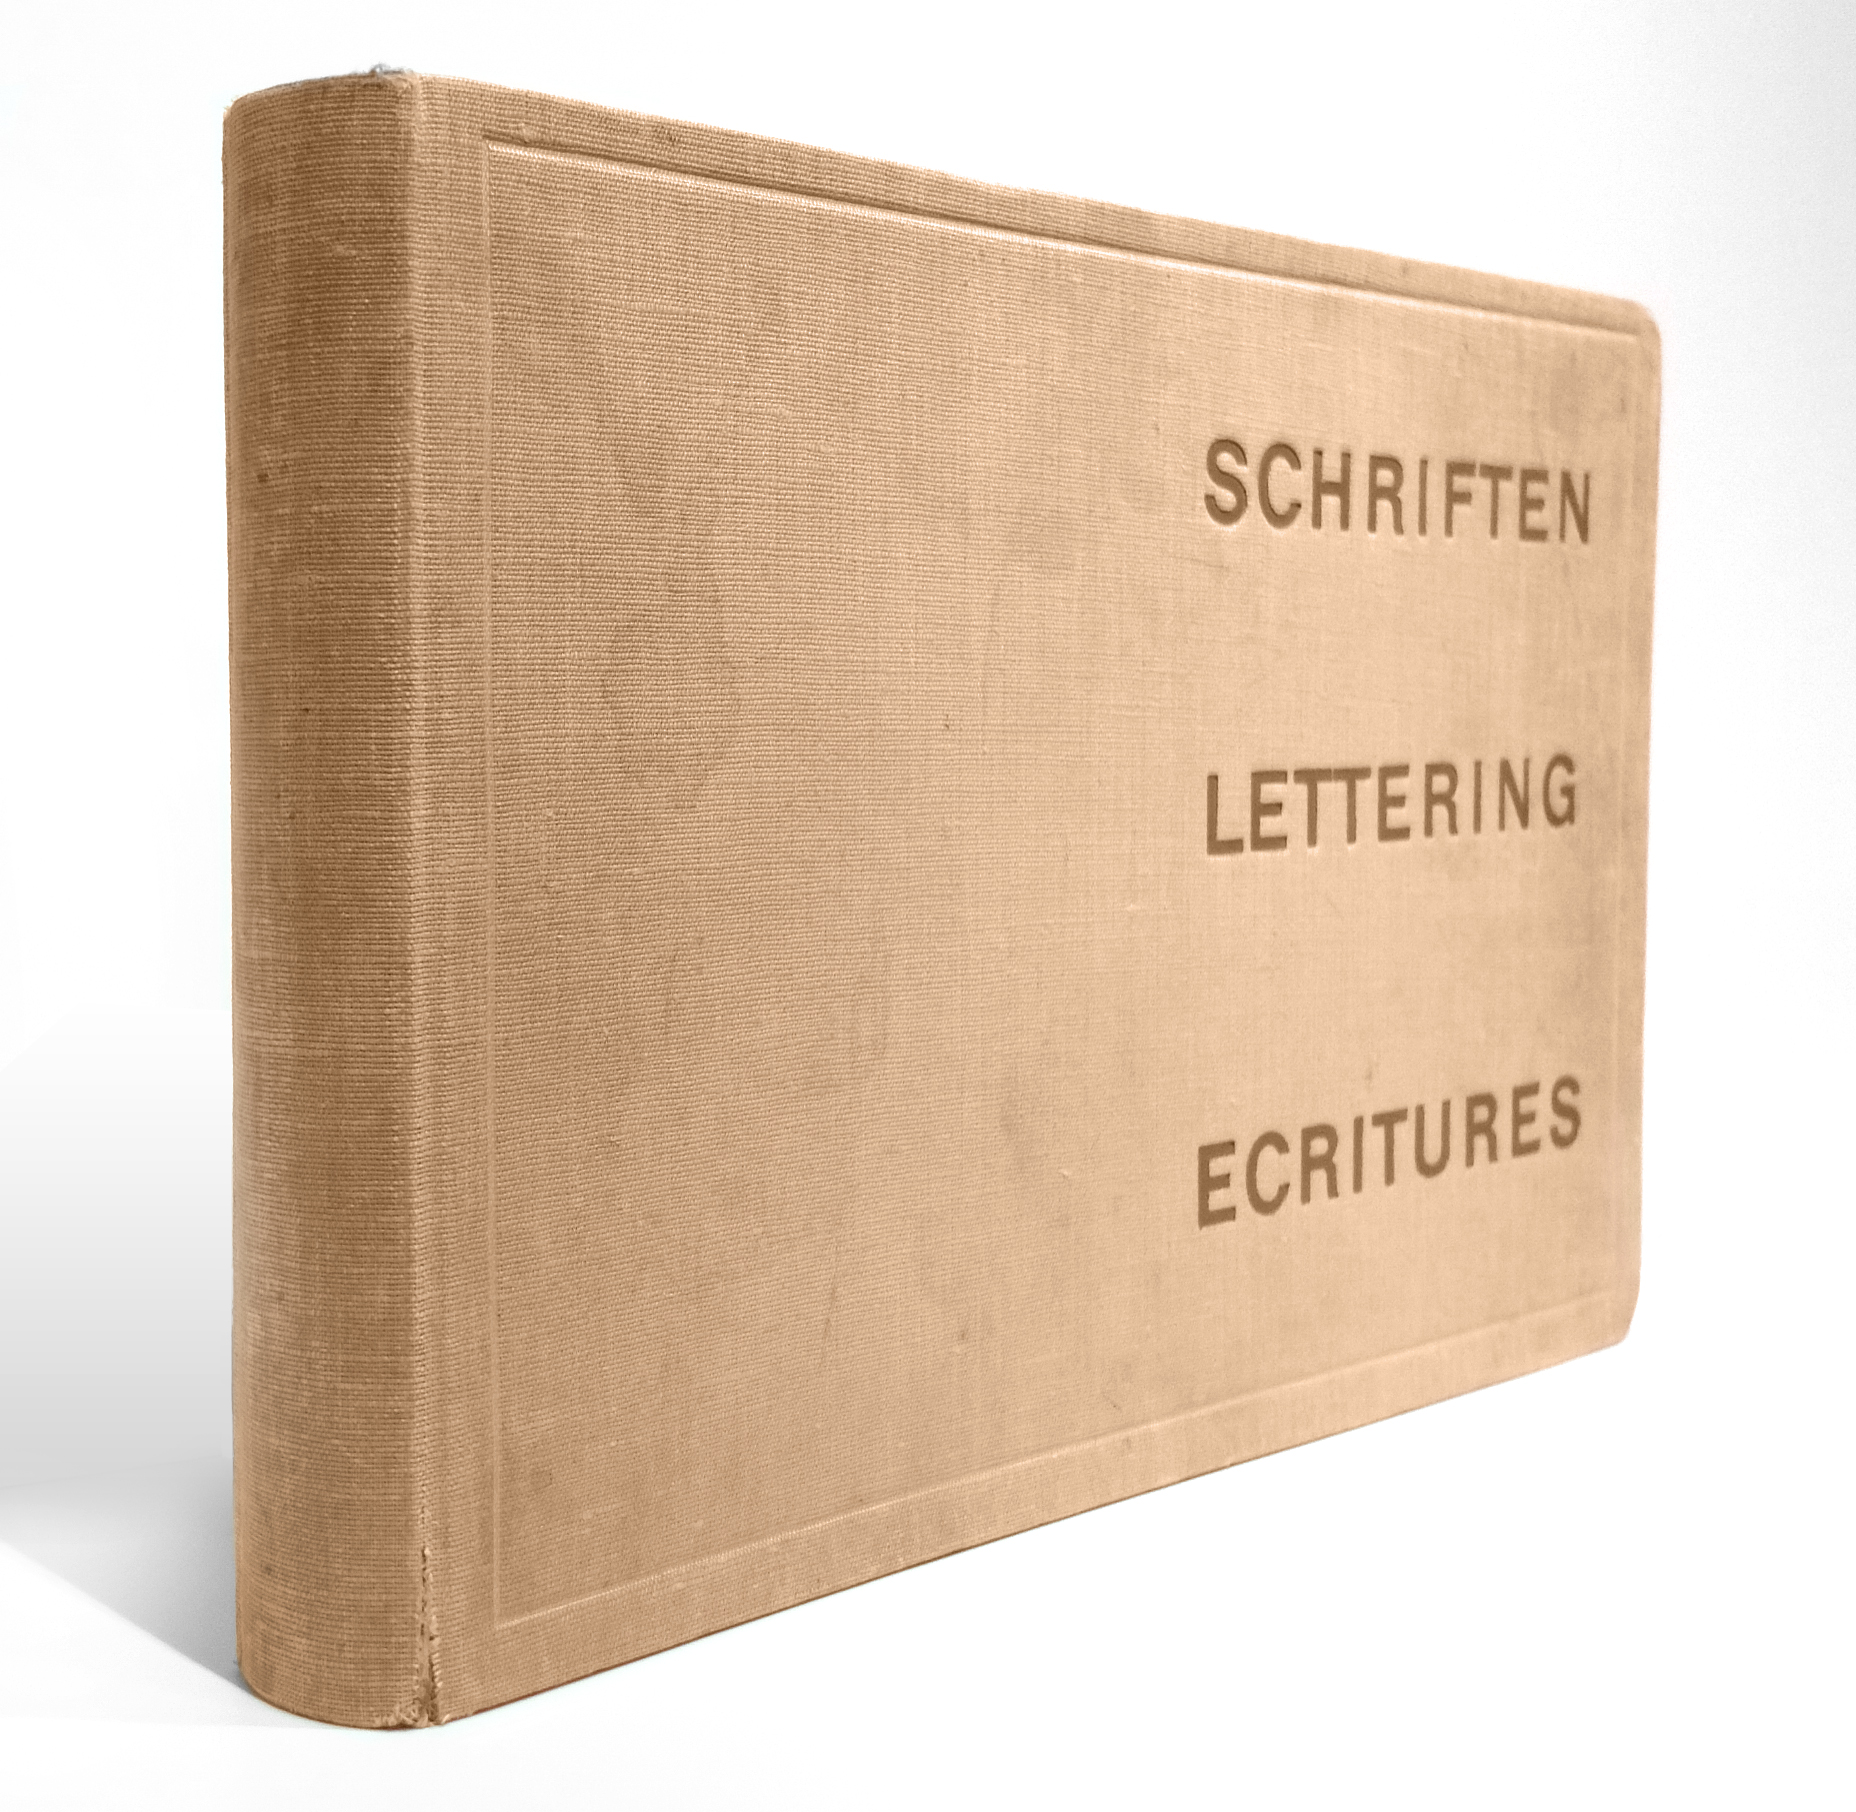 Walter Käch - Schriften, Lettering, Écritures (1949)